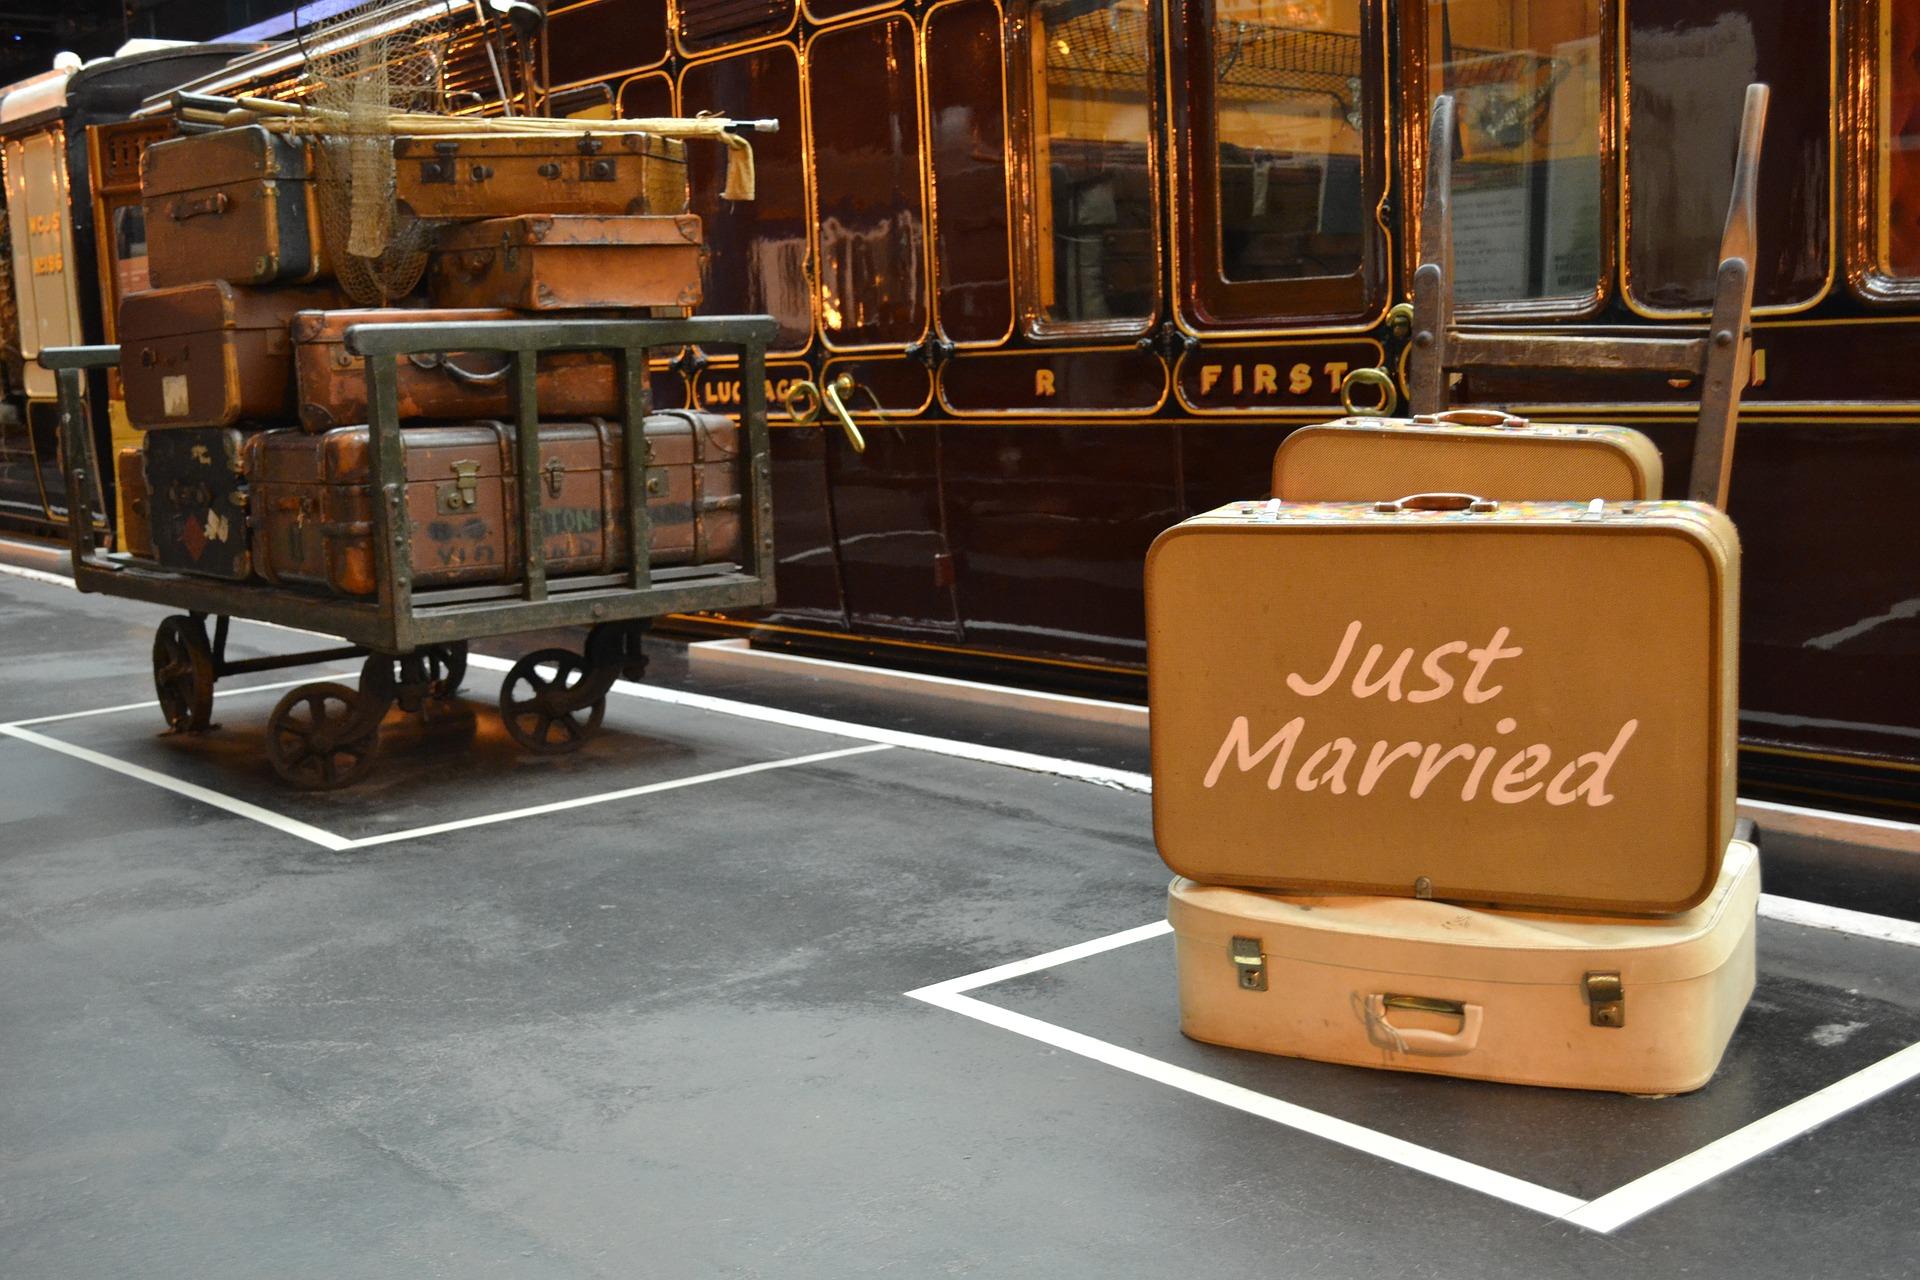 Huwelijksreizen tips | Voyage Unique - Reisbureau Sint-Martens-Latem